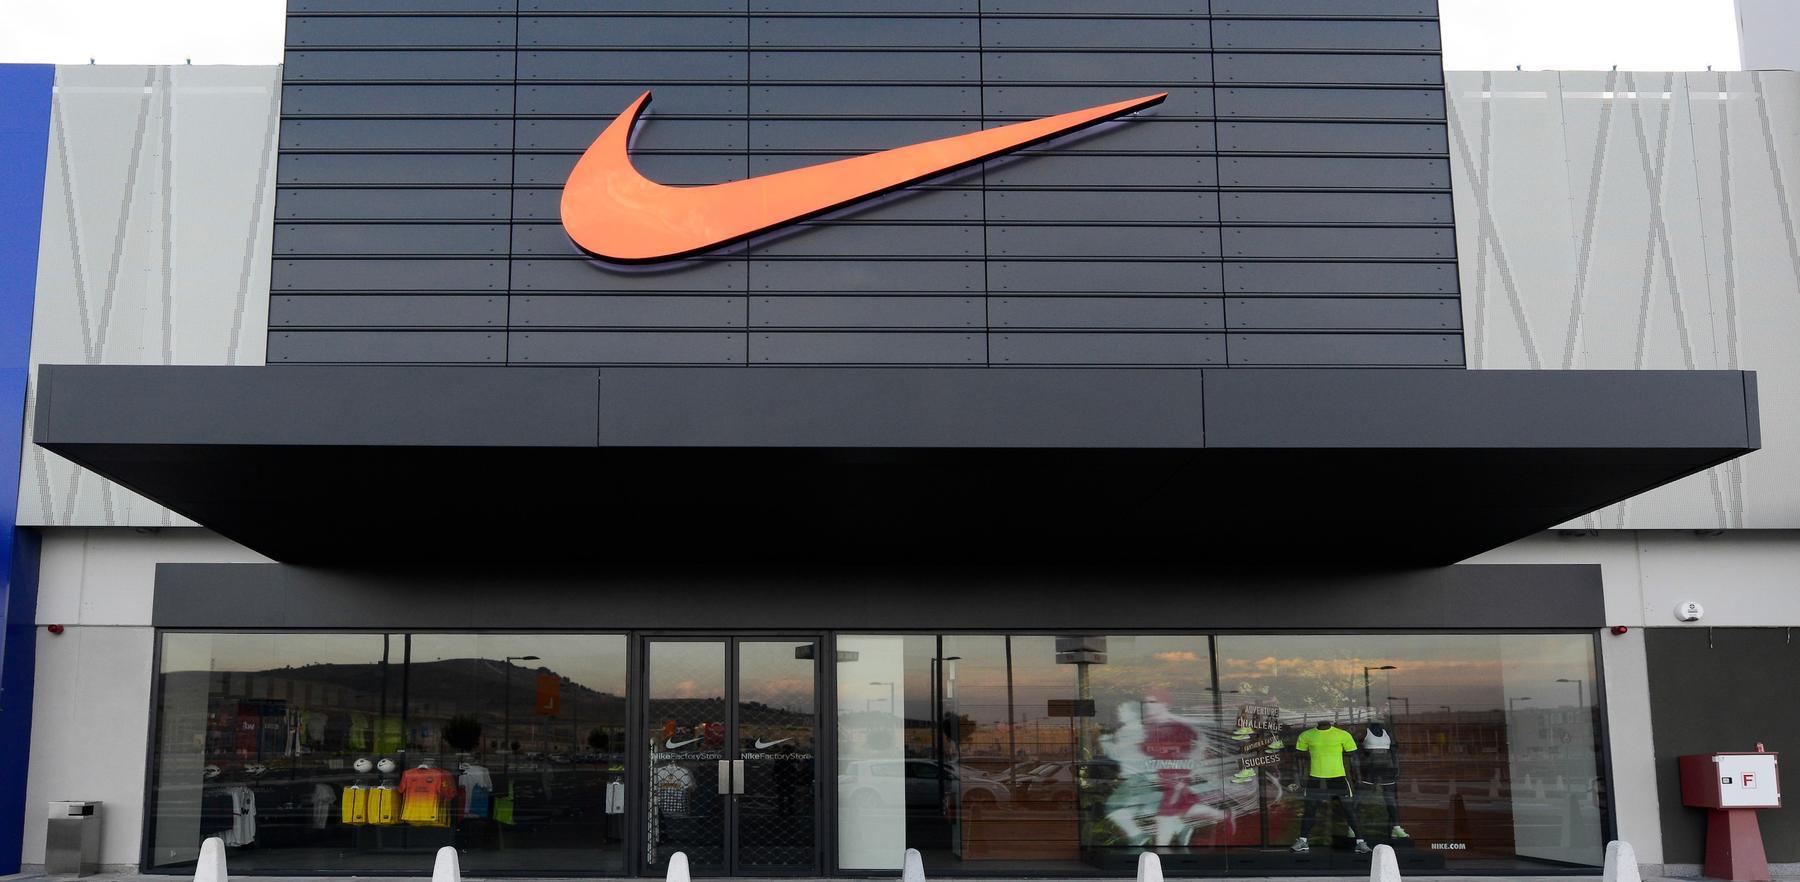 fa1f1b3d6058f Nike Factory Store Valladolid. Valladolid, . Nike.com